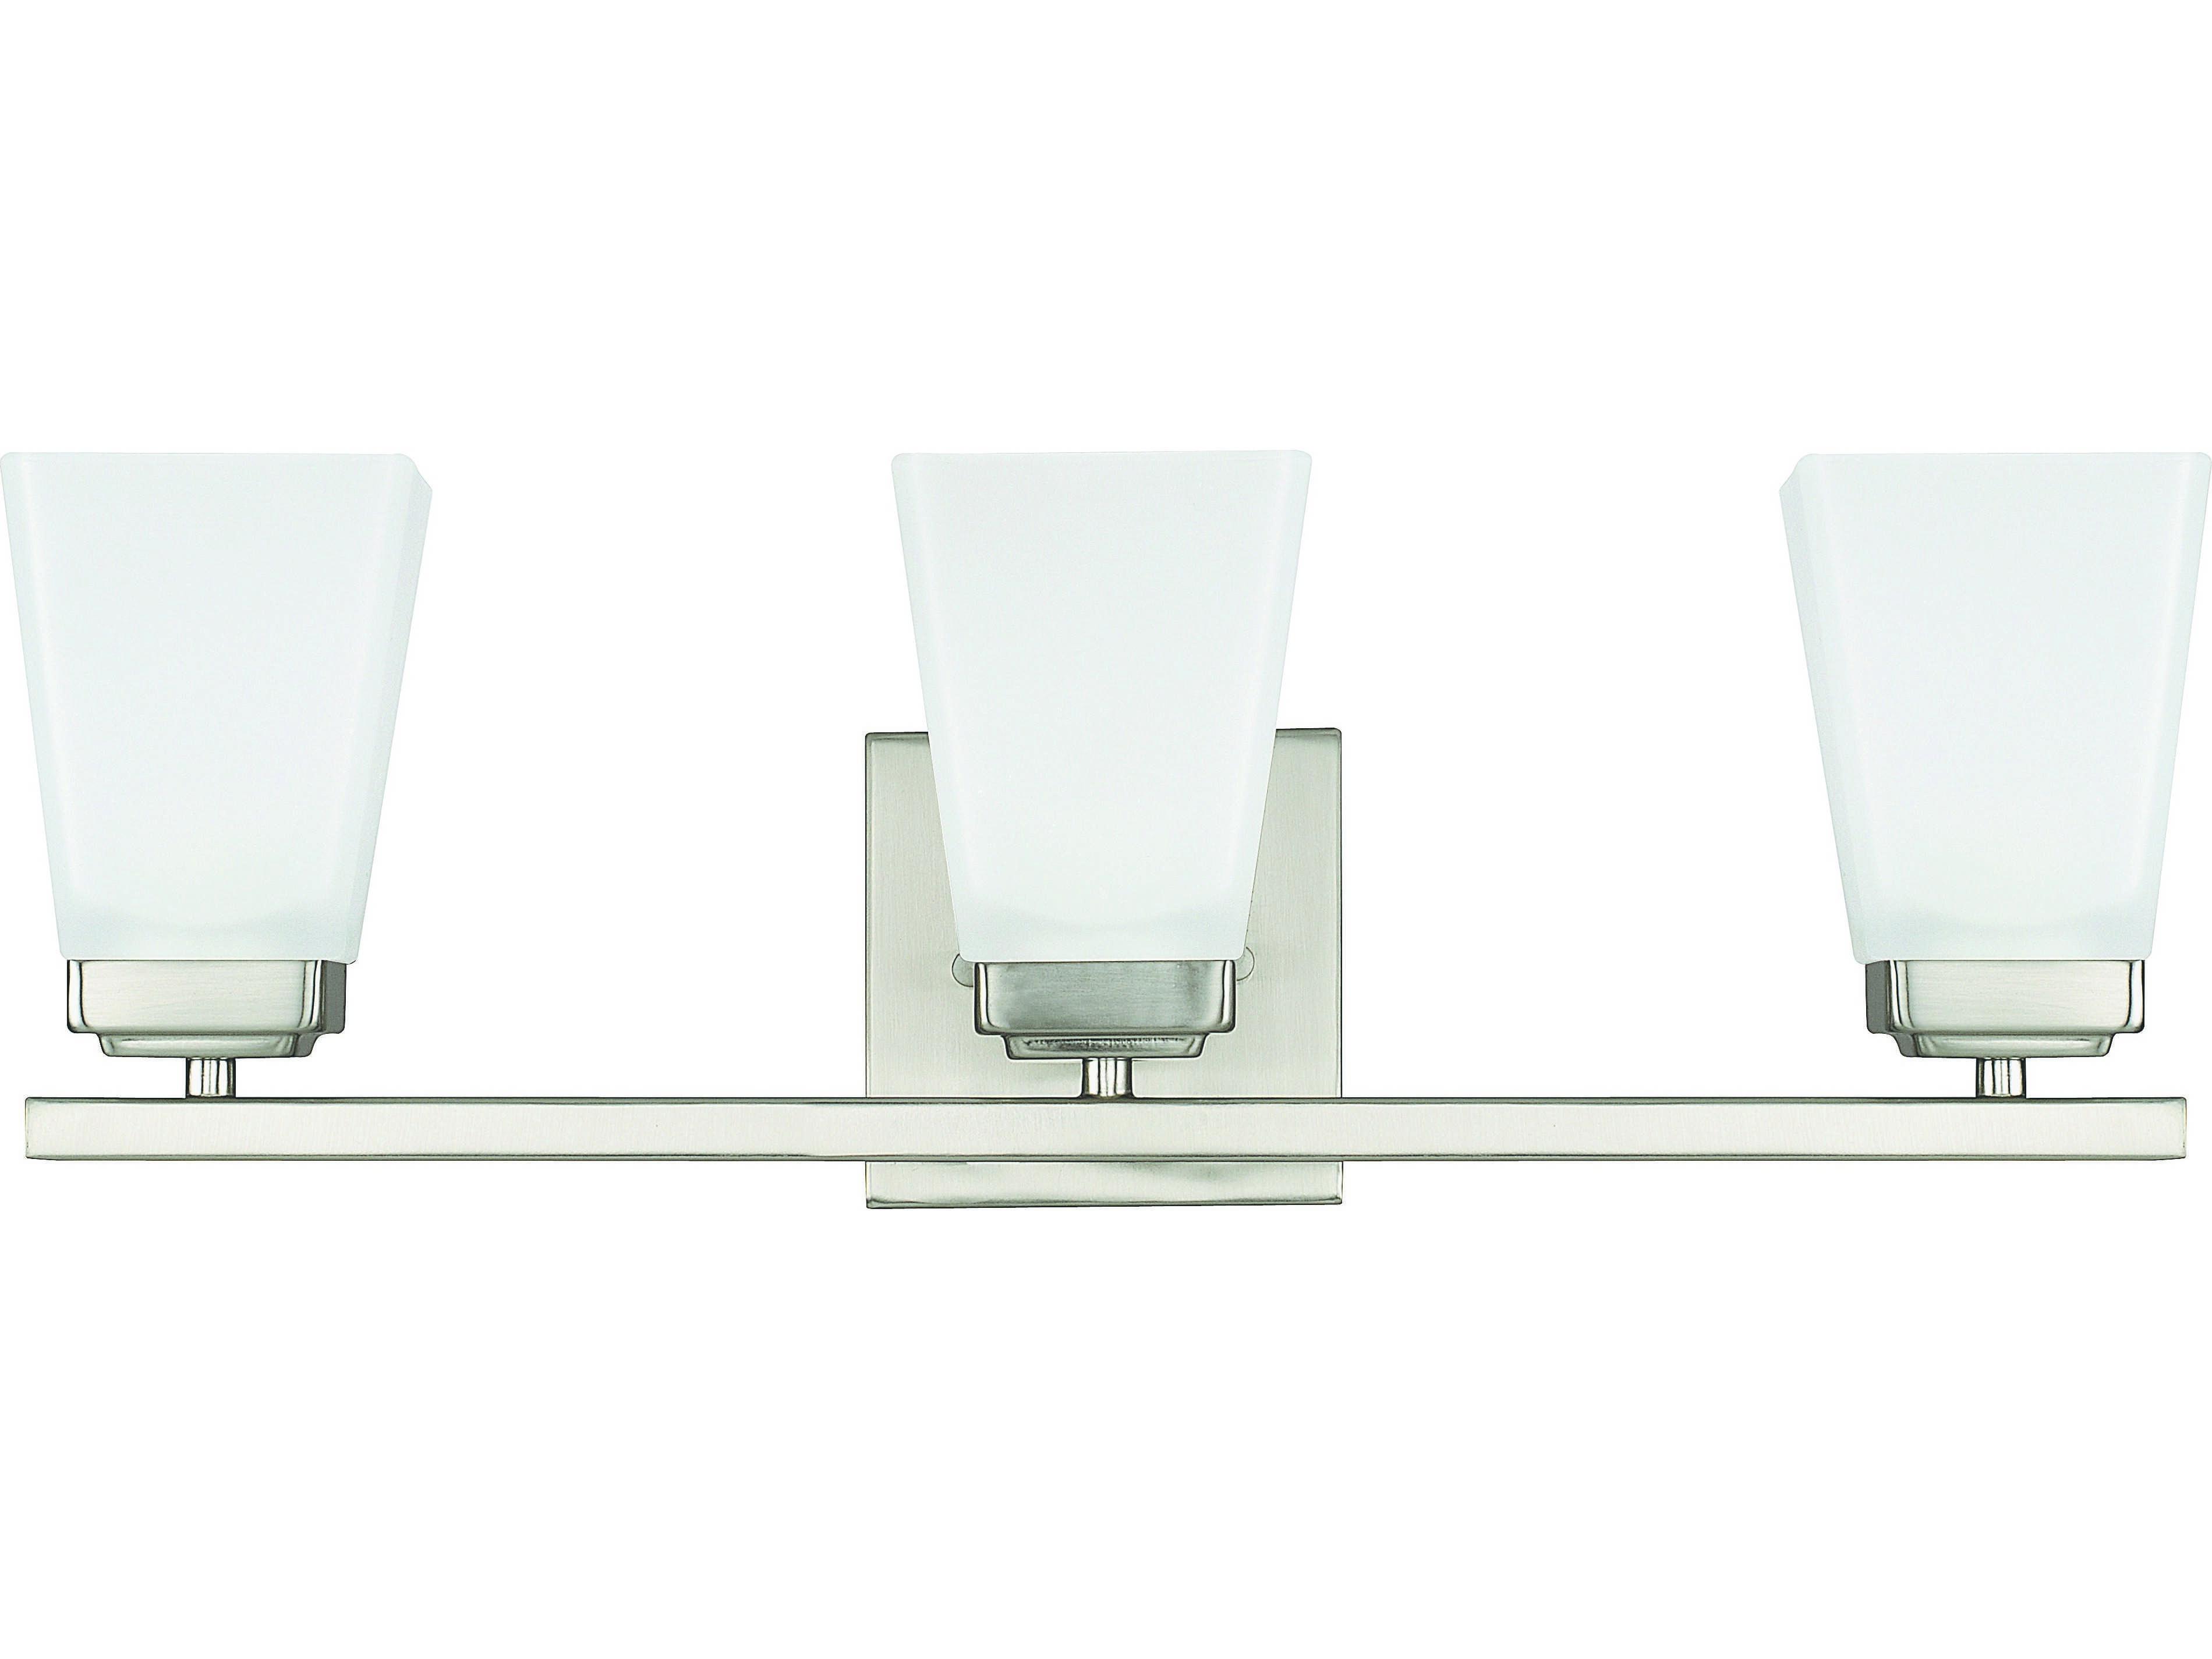 Capital Lighting 4 Light Vanity Fixture Brushed Nickel: Capital Lighting HomePlace Lighting Baxley Brushed Nickel